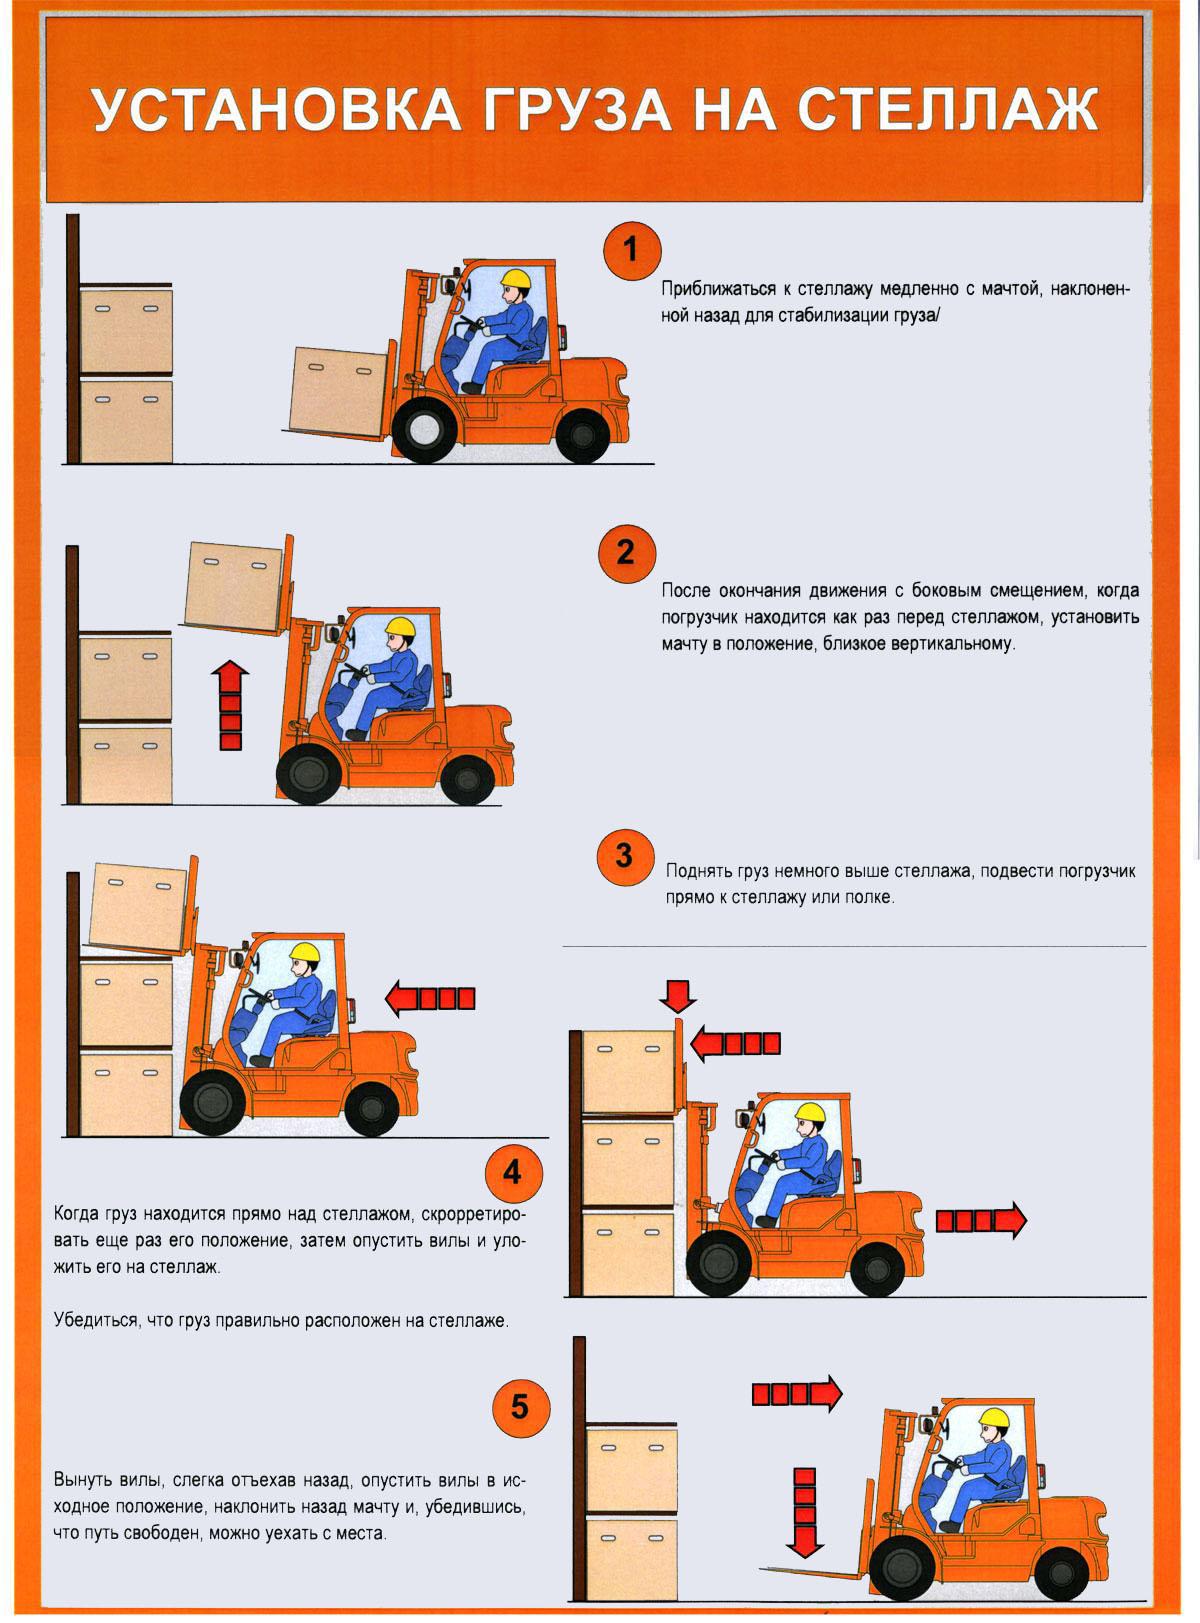 Правила техники безопасности при работе на автопогрузчике